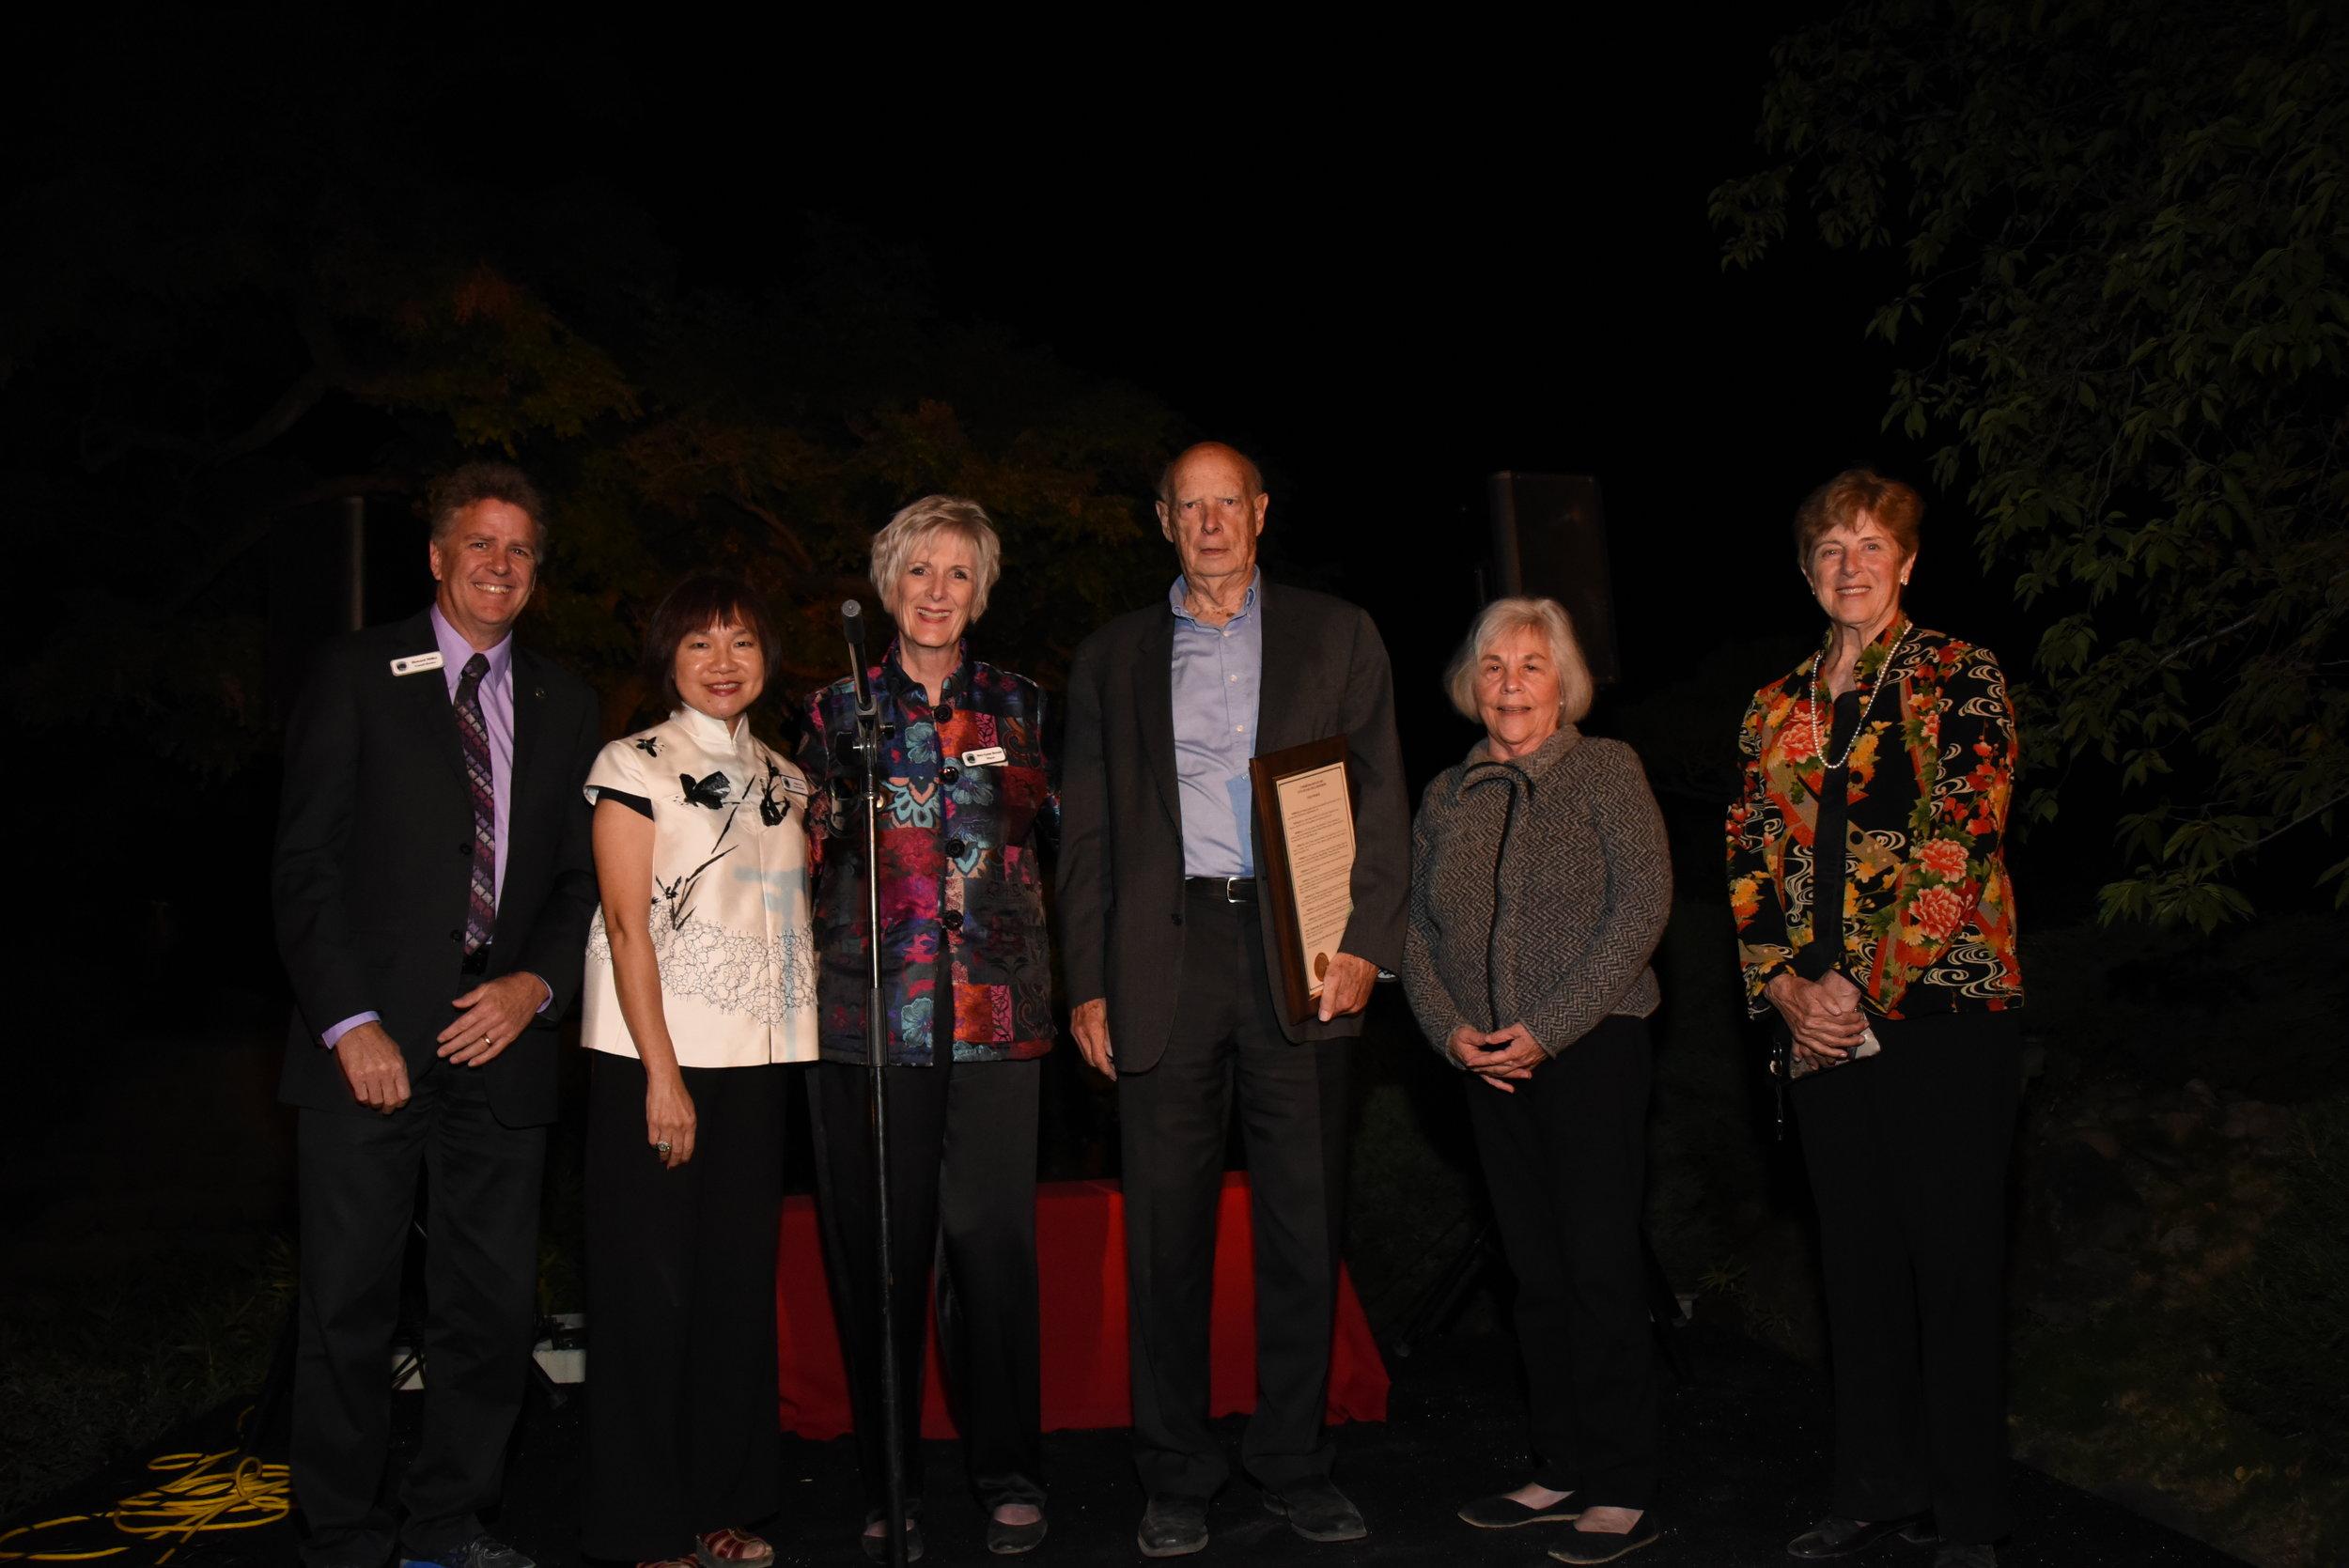 Cole Wilbur with City Council and Ann Waltonsmith-09162018.JPG